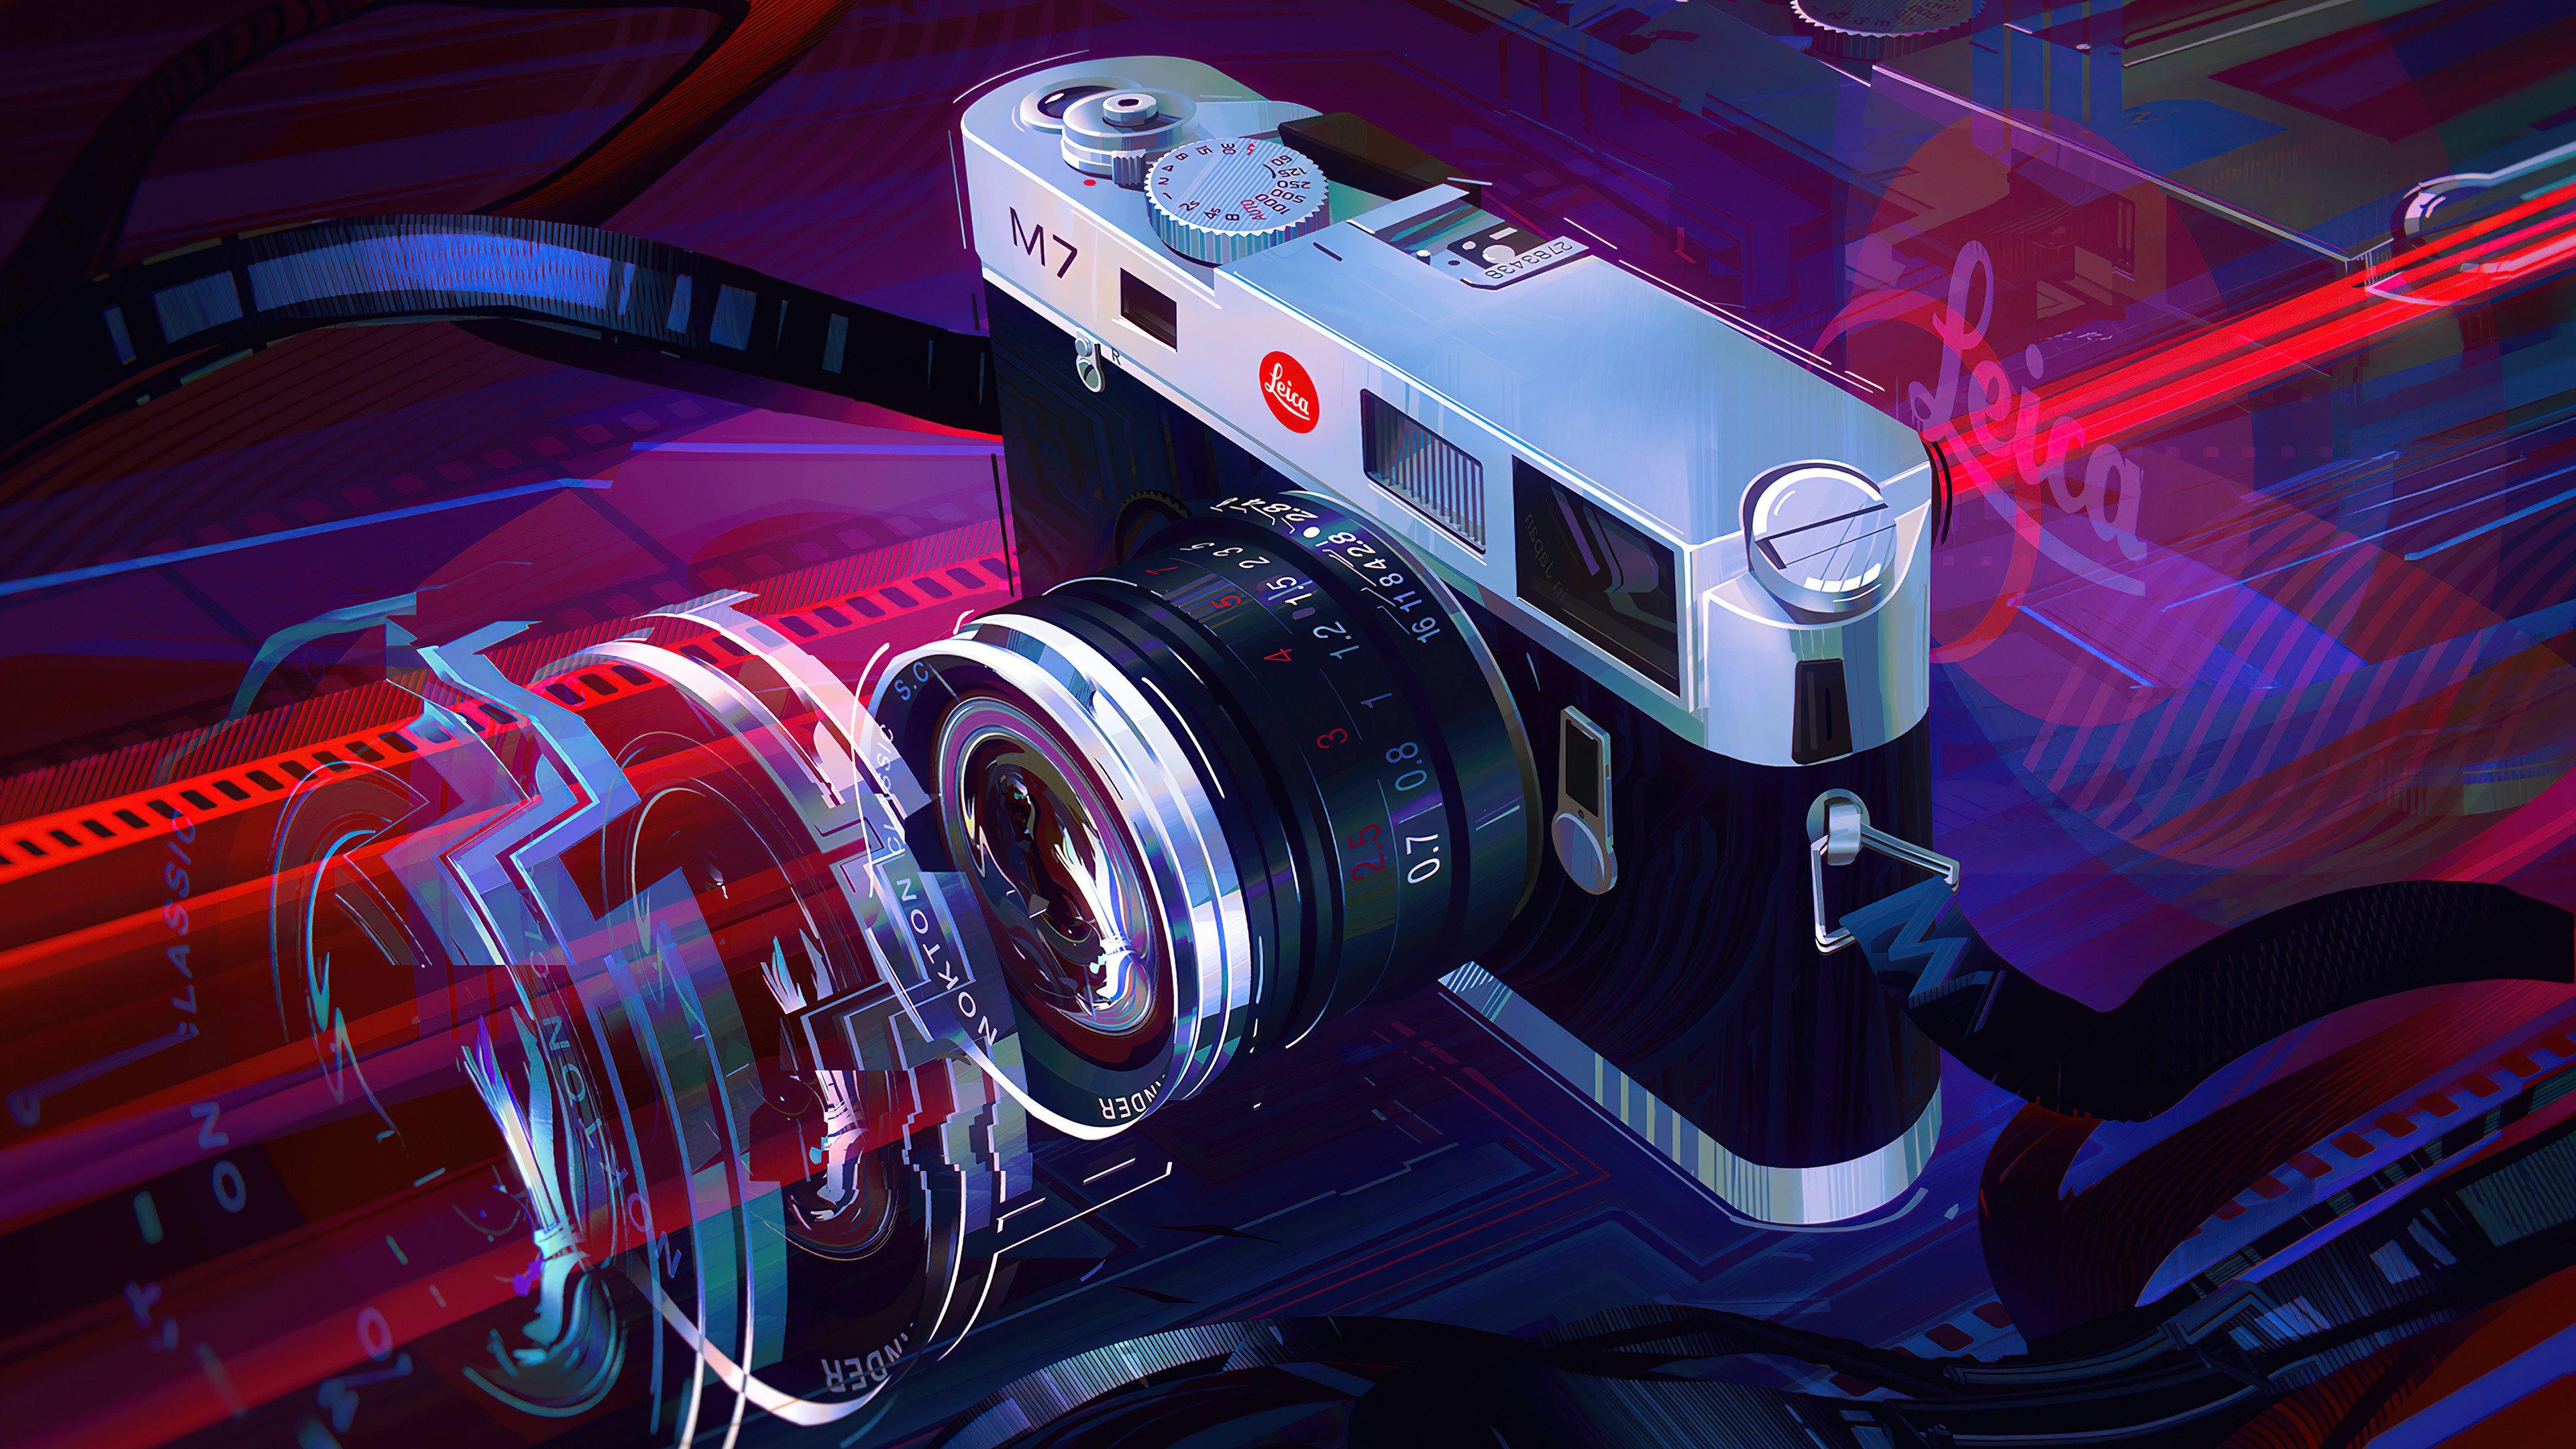 Fondos de pantalla Camara Arte Digital